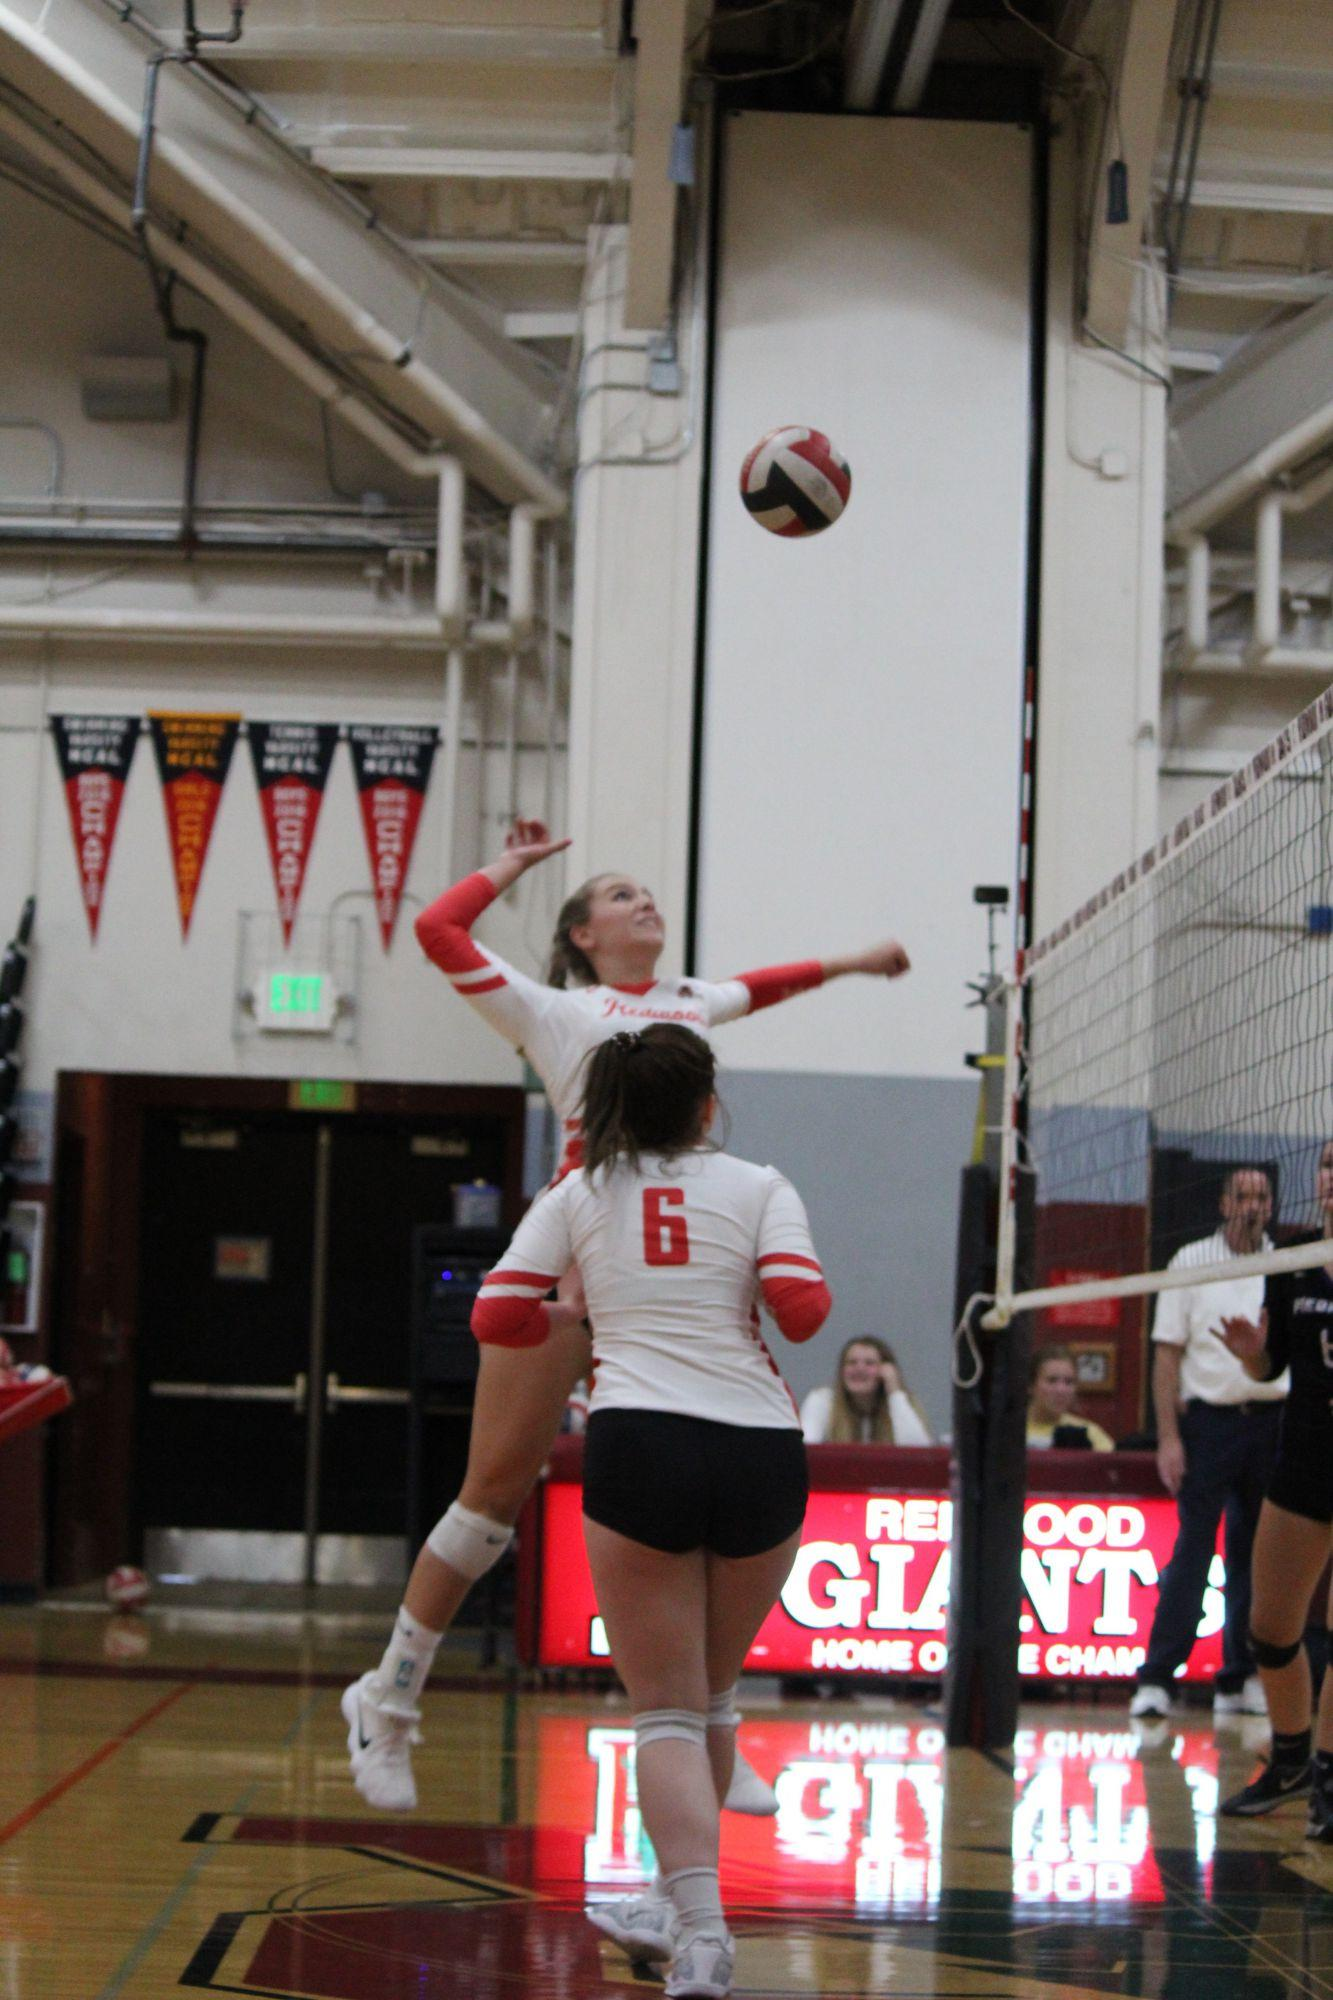 Freshman+Brooke+Leslie+hits+the+ball.+